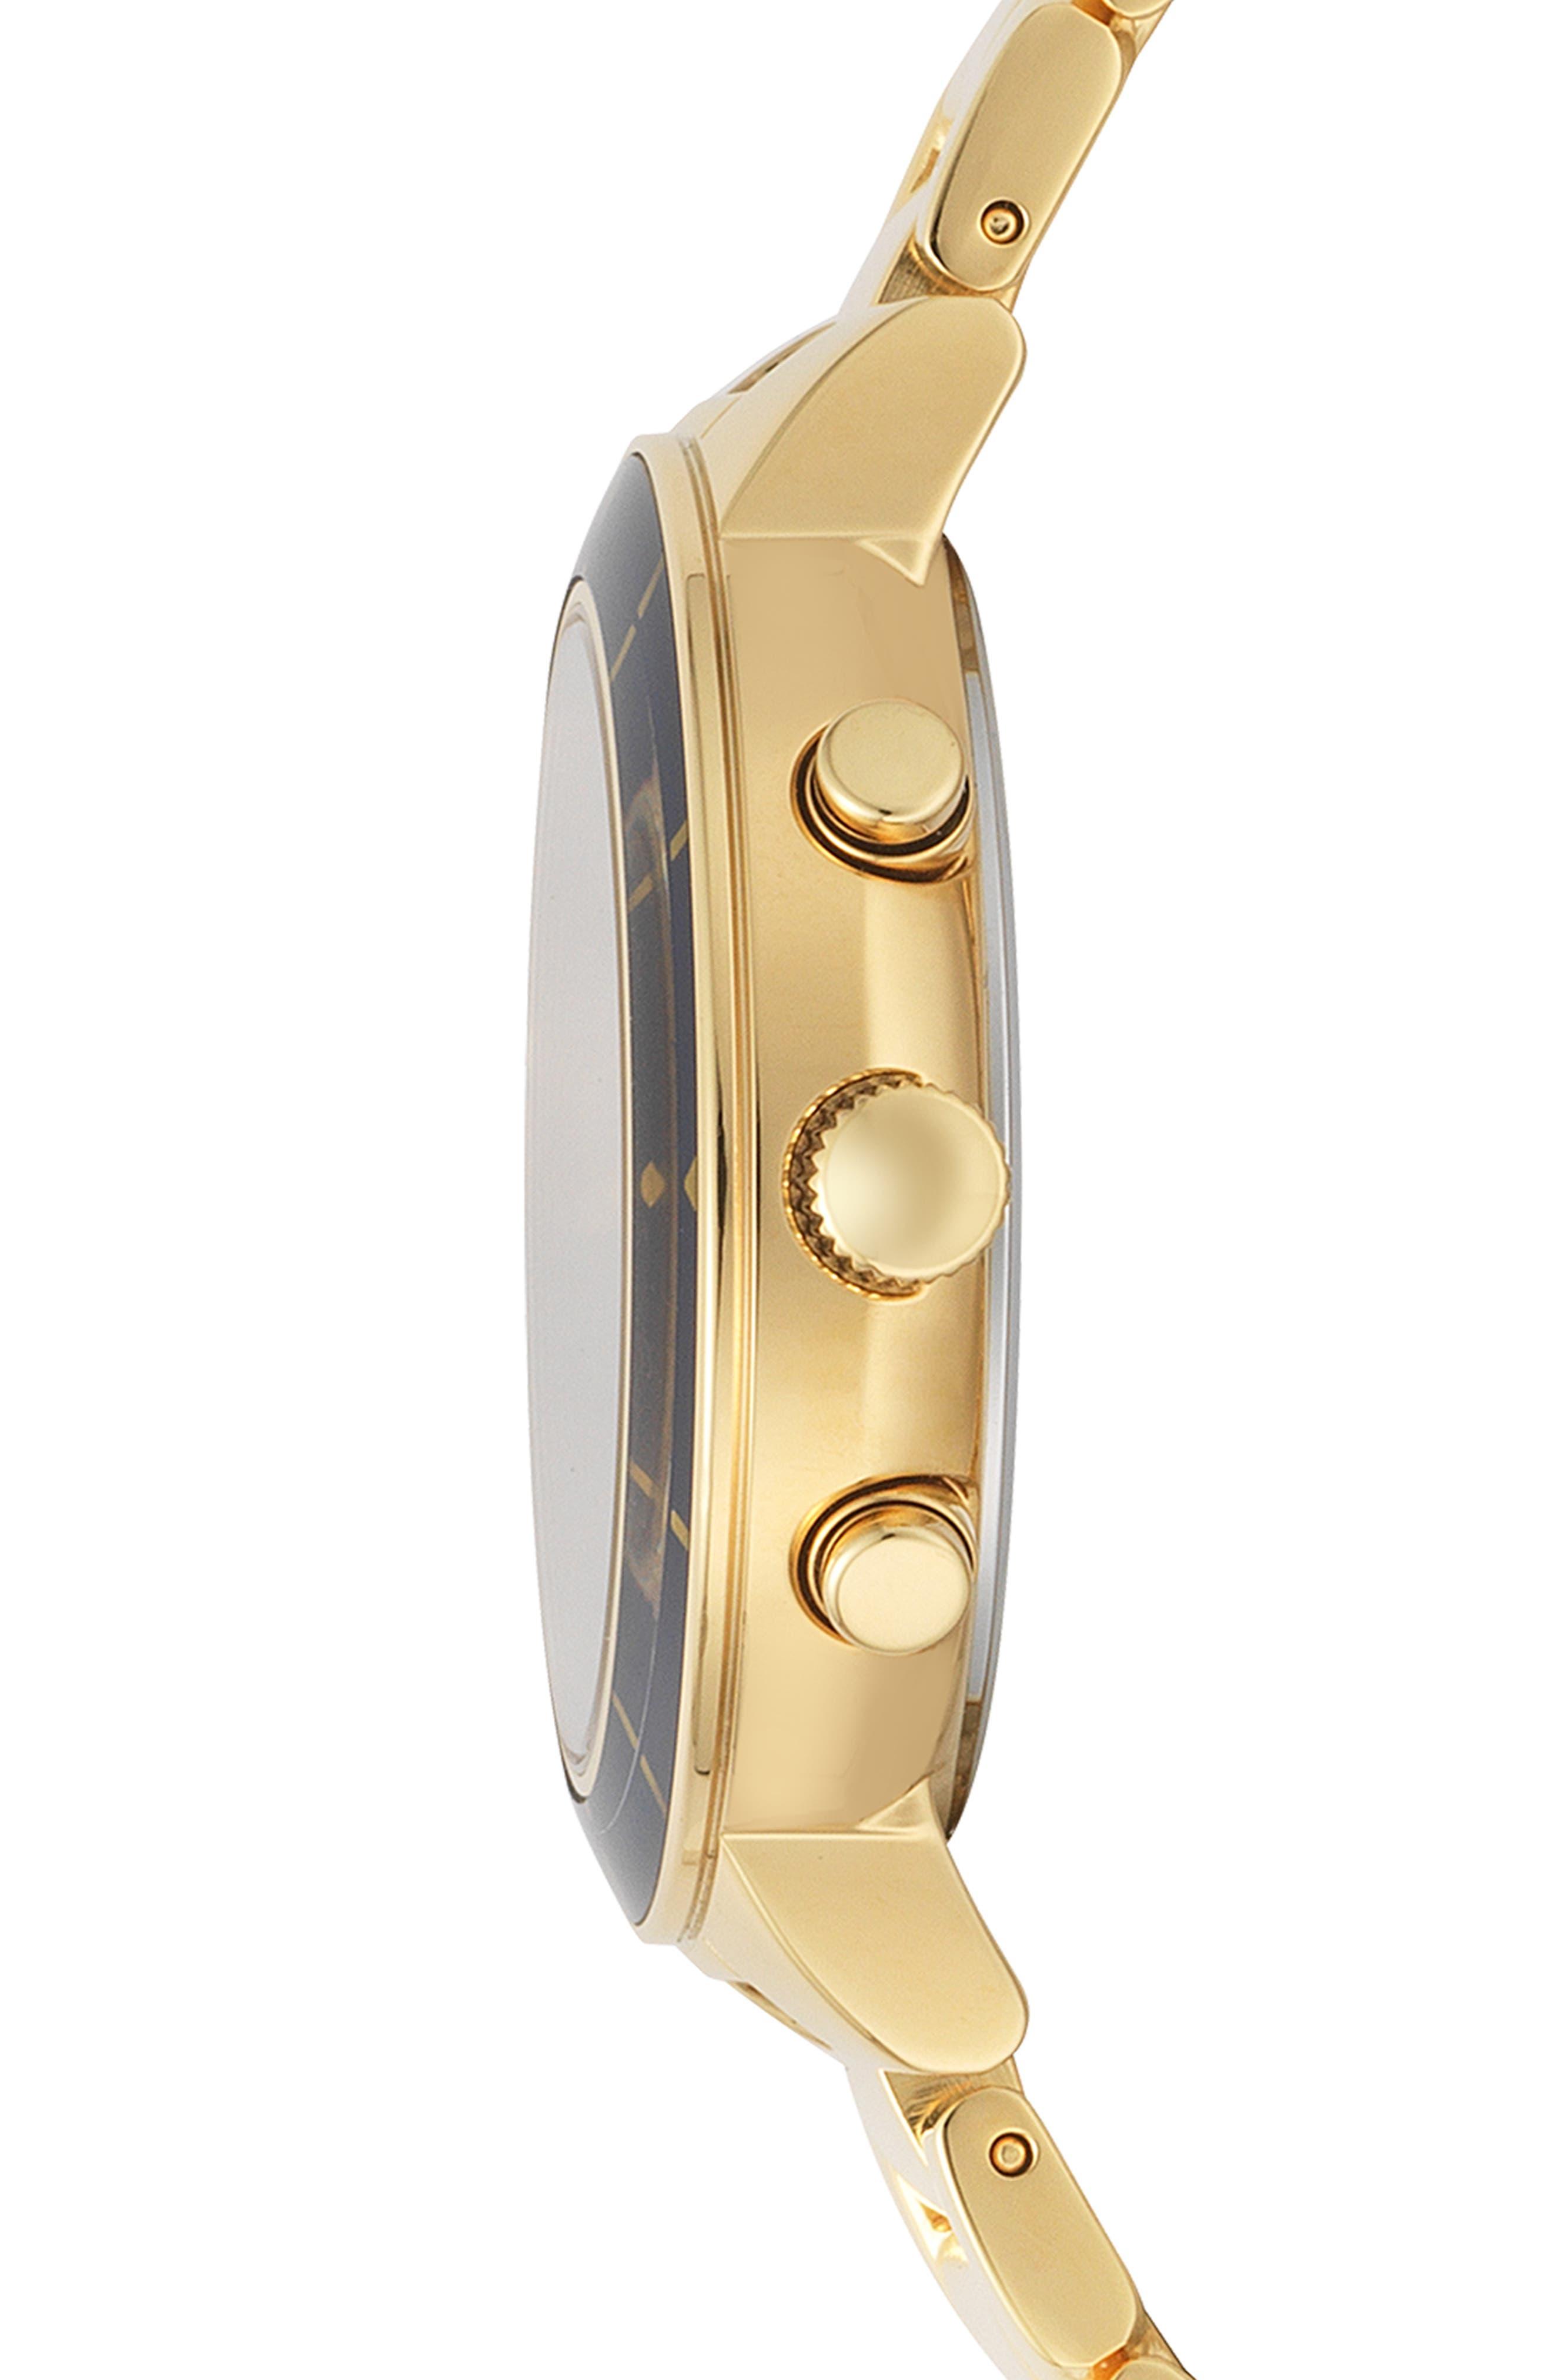 VERSUS VERSACE, Harbour Heights Chronograph Bracelet Watch, 38mm, Alternate thumbnail 2, color, GOLD/ BLUE